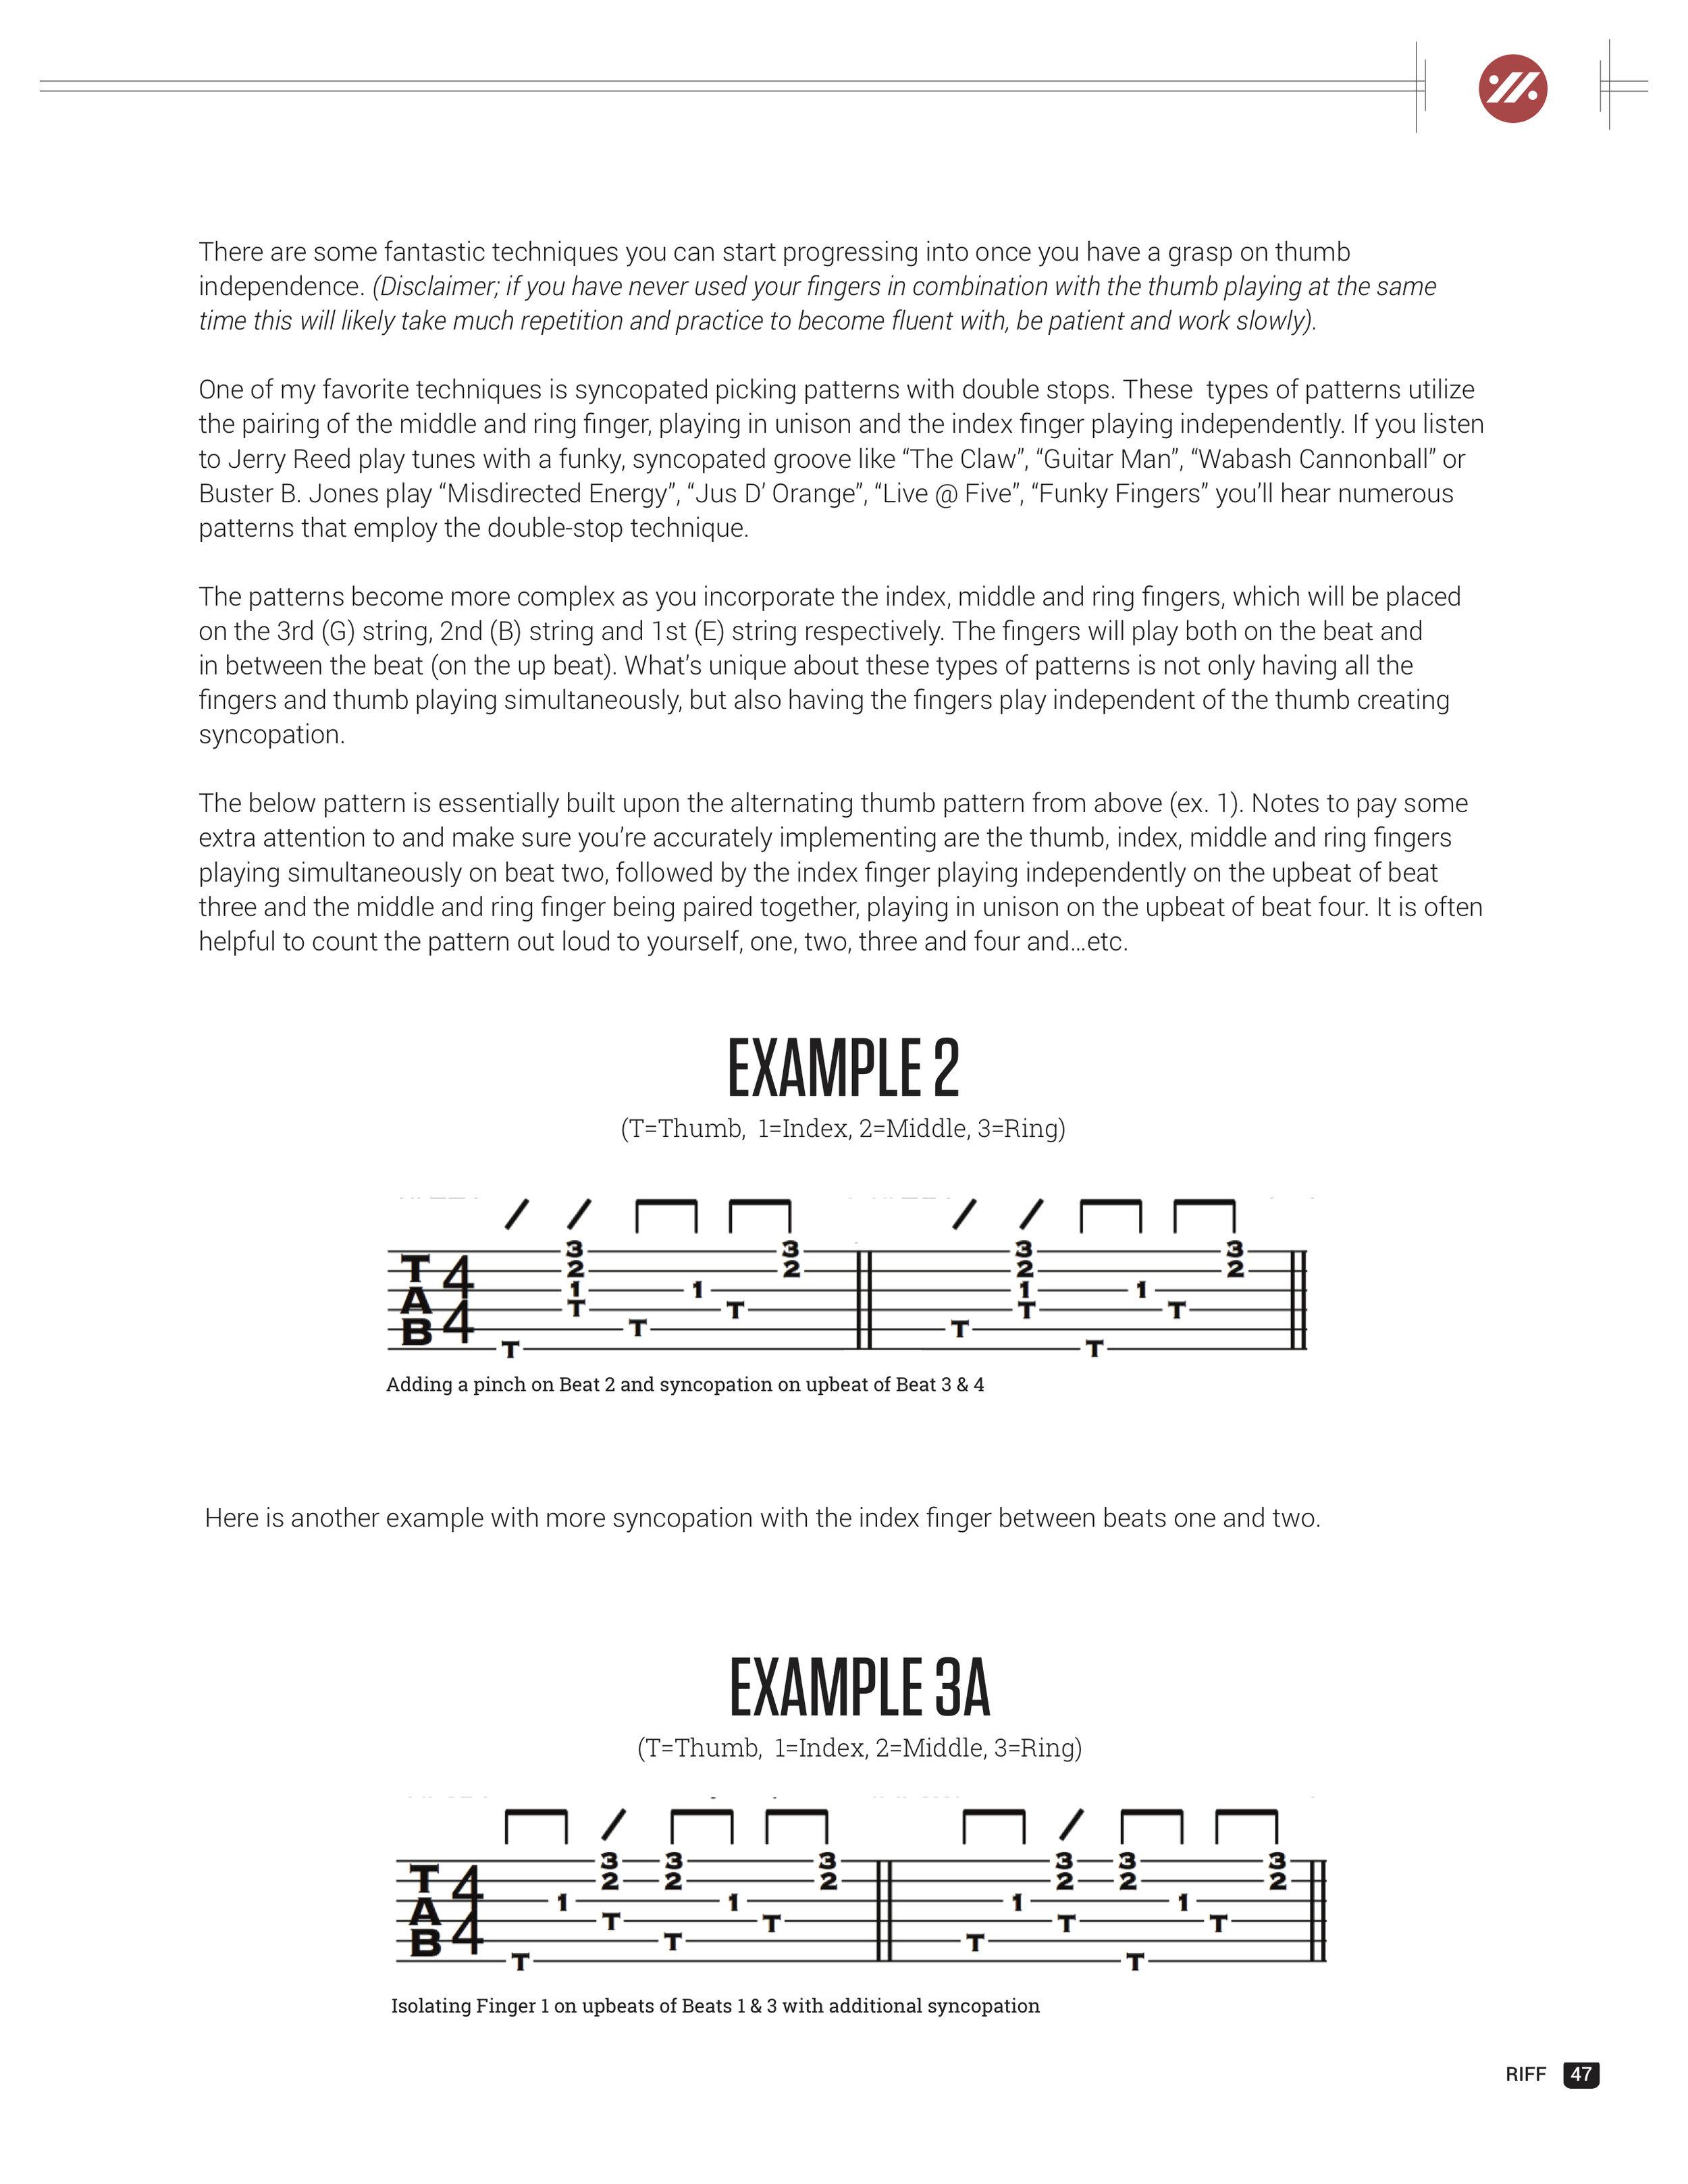 Double Stop Picking Patterns Article RIFFp2.jpg